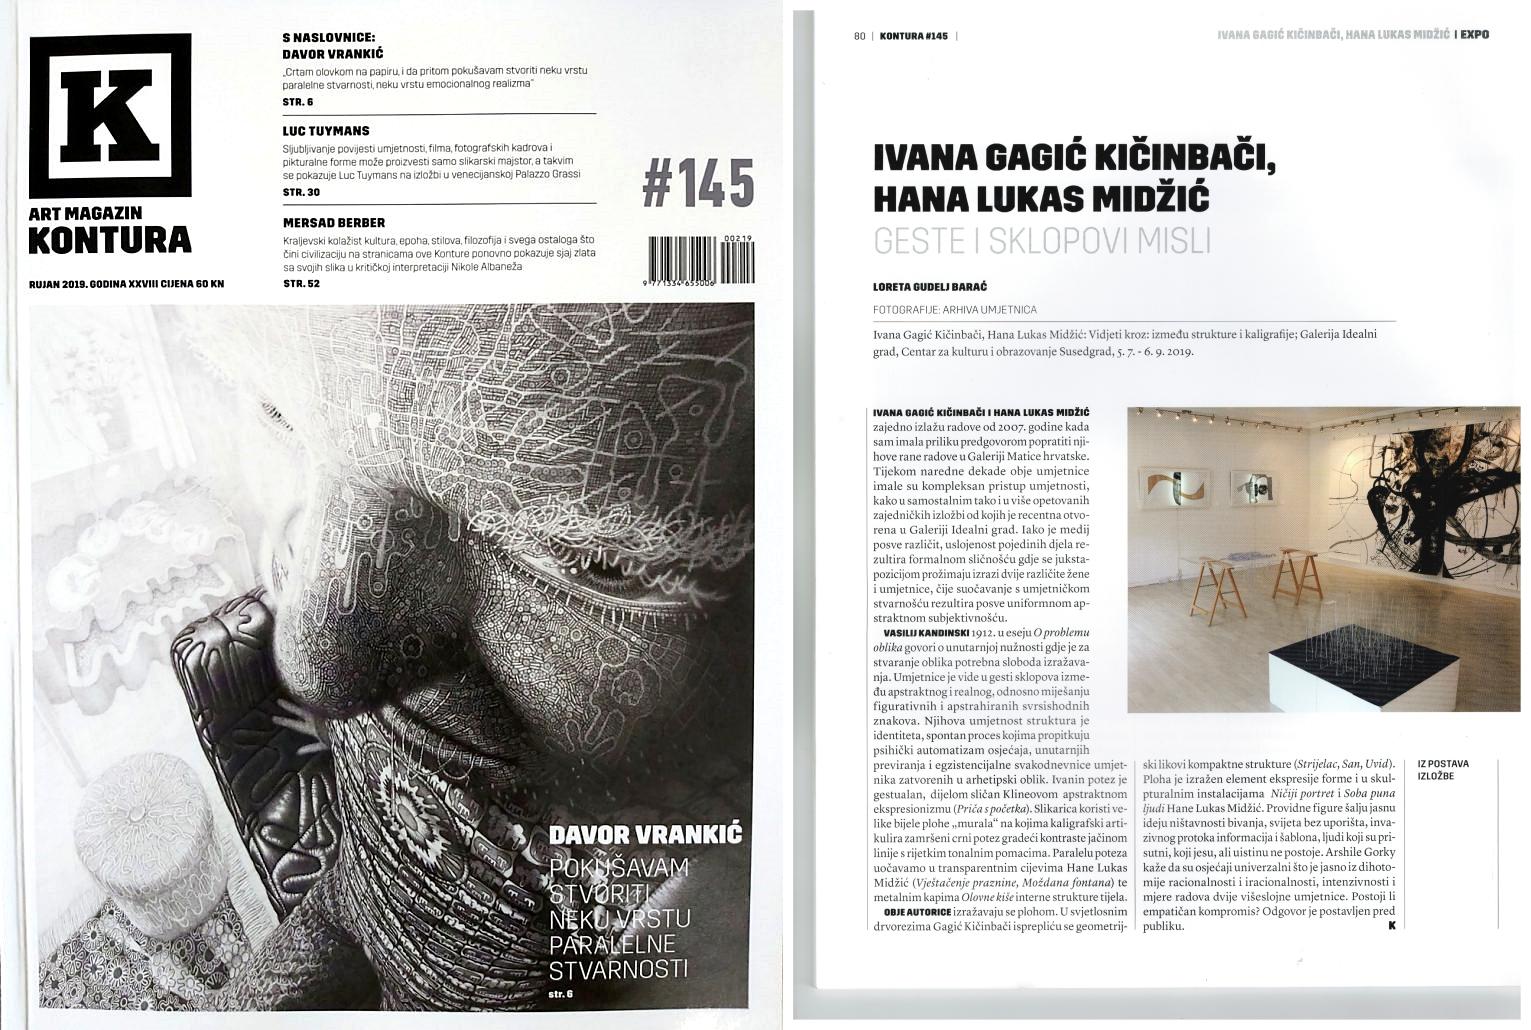 Kontura_art magazin-br-145-2019_side